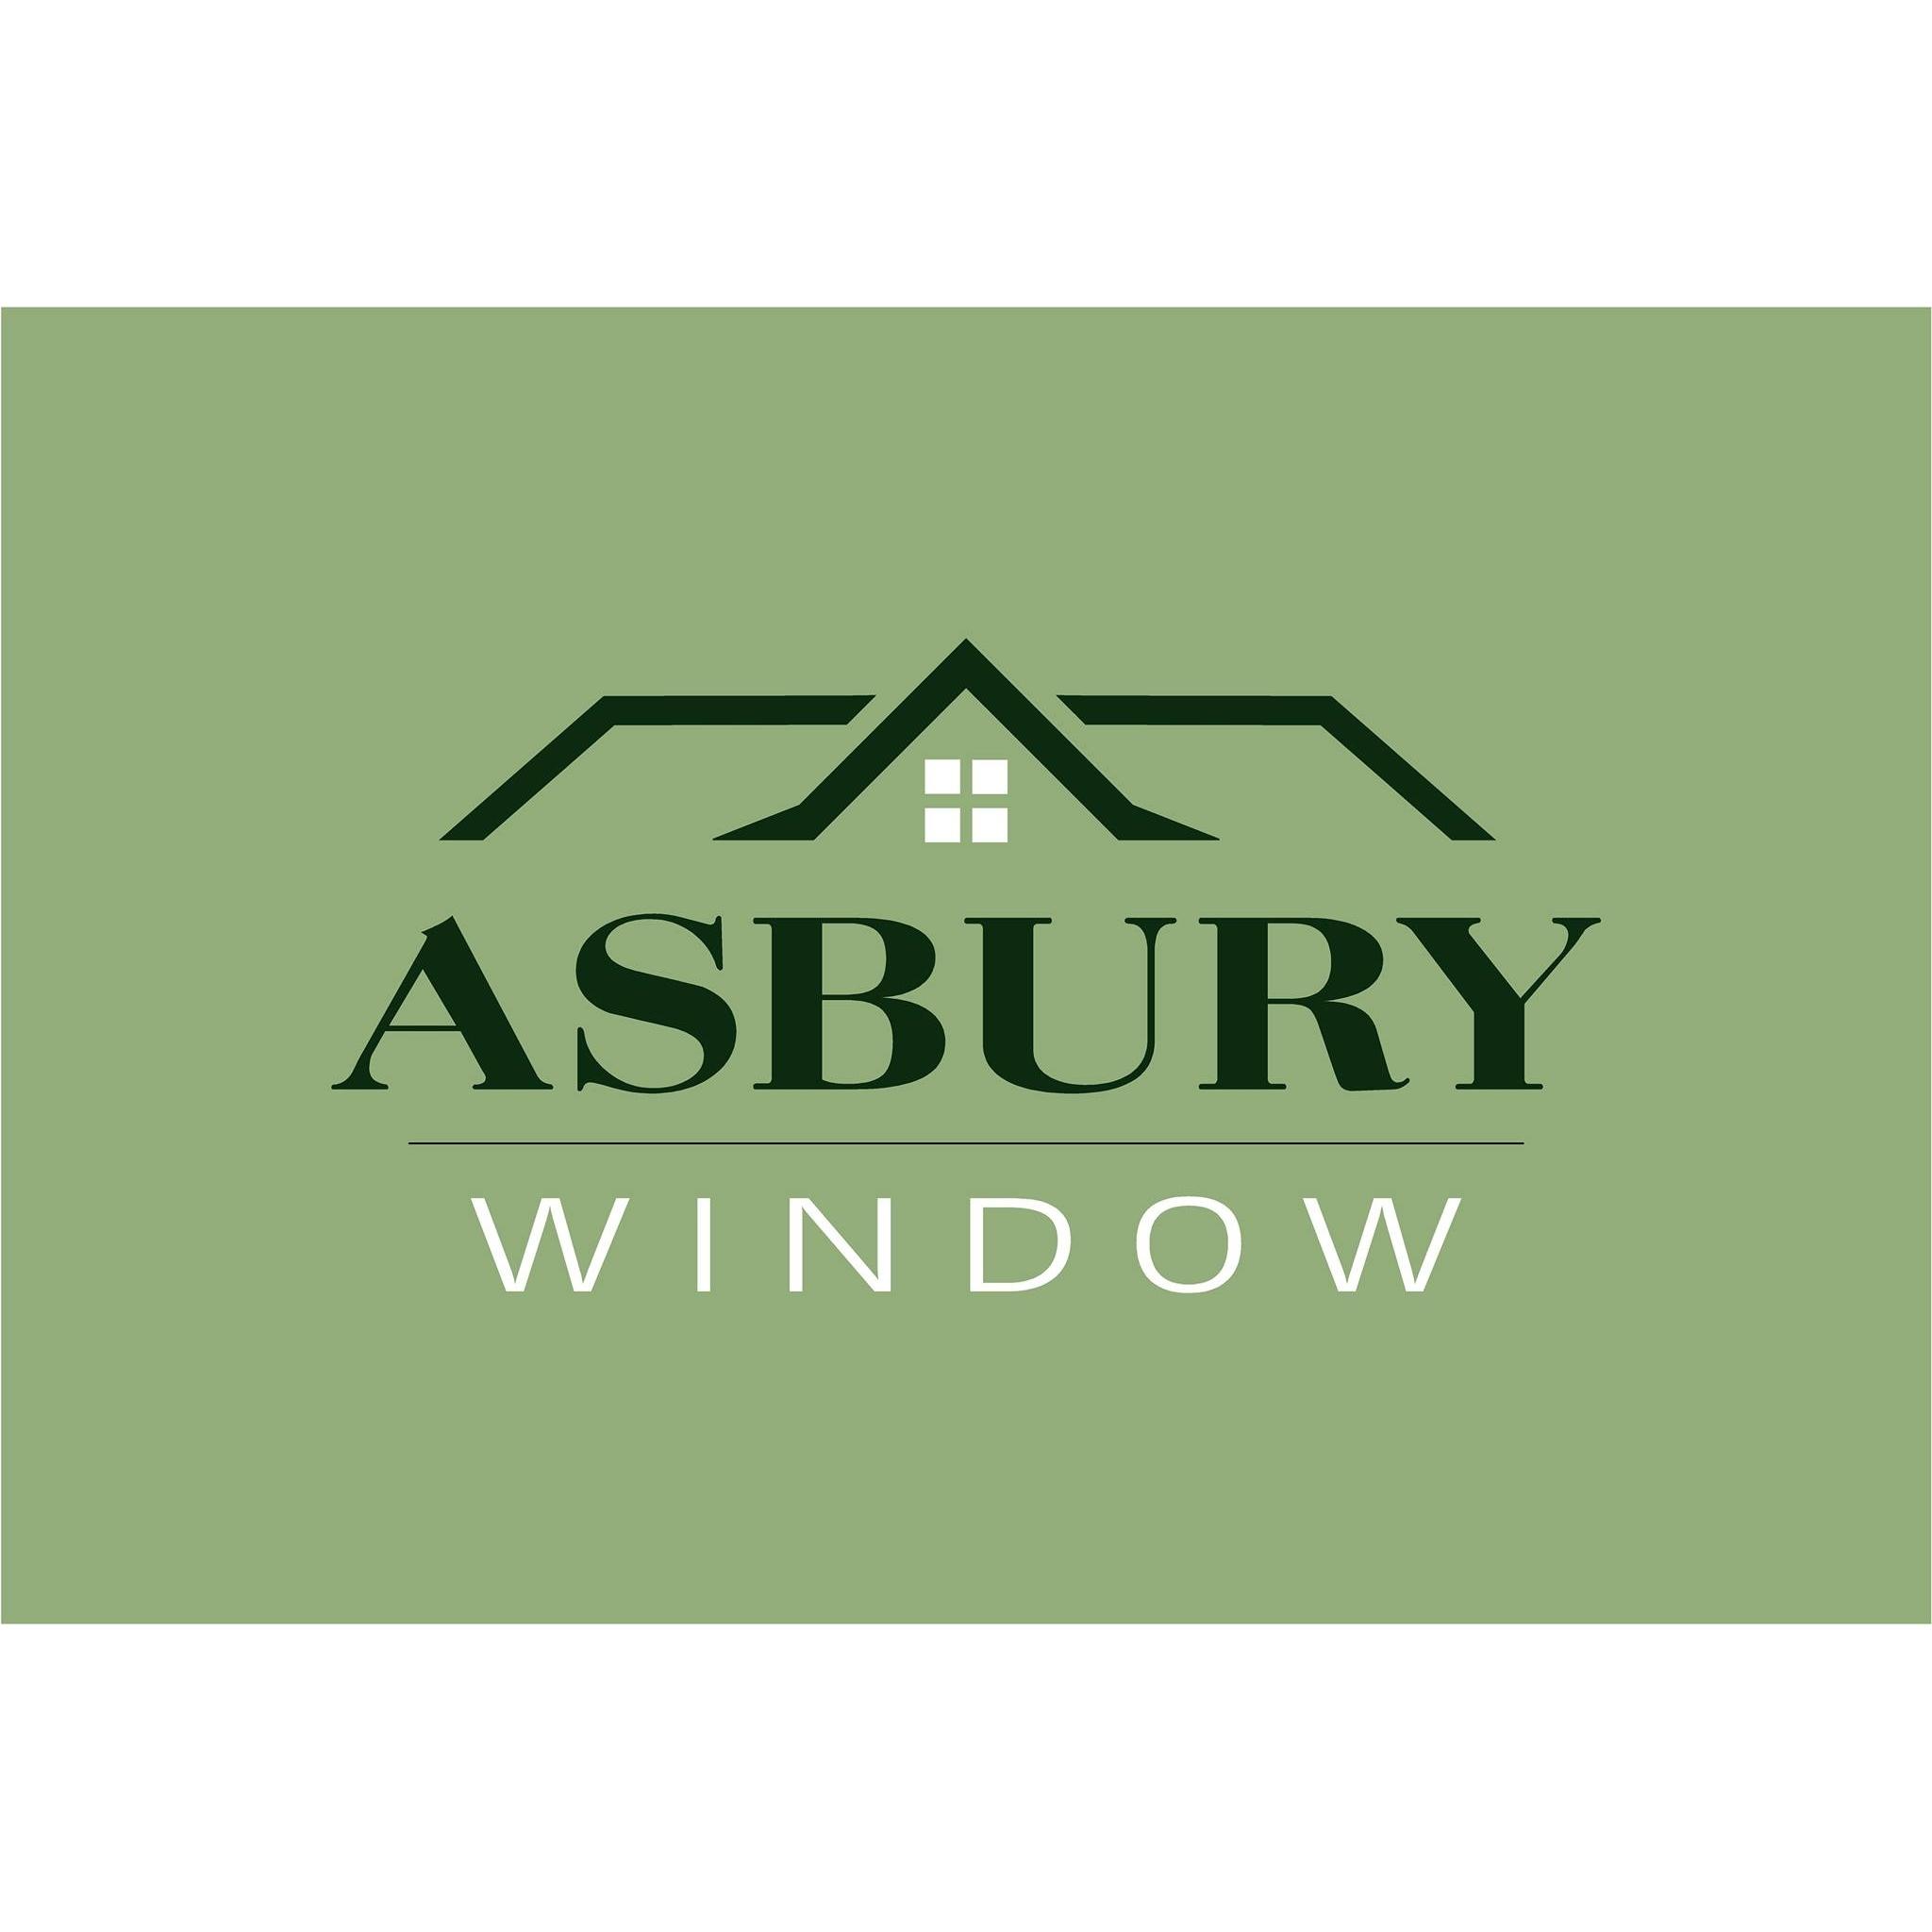 Asbury Window & More